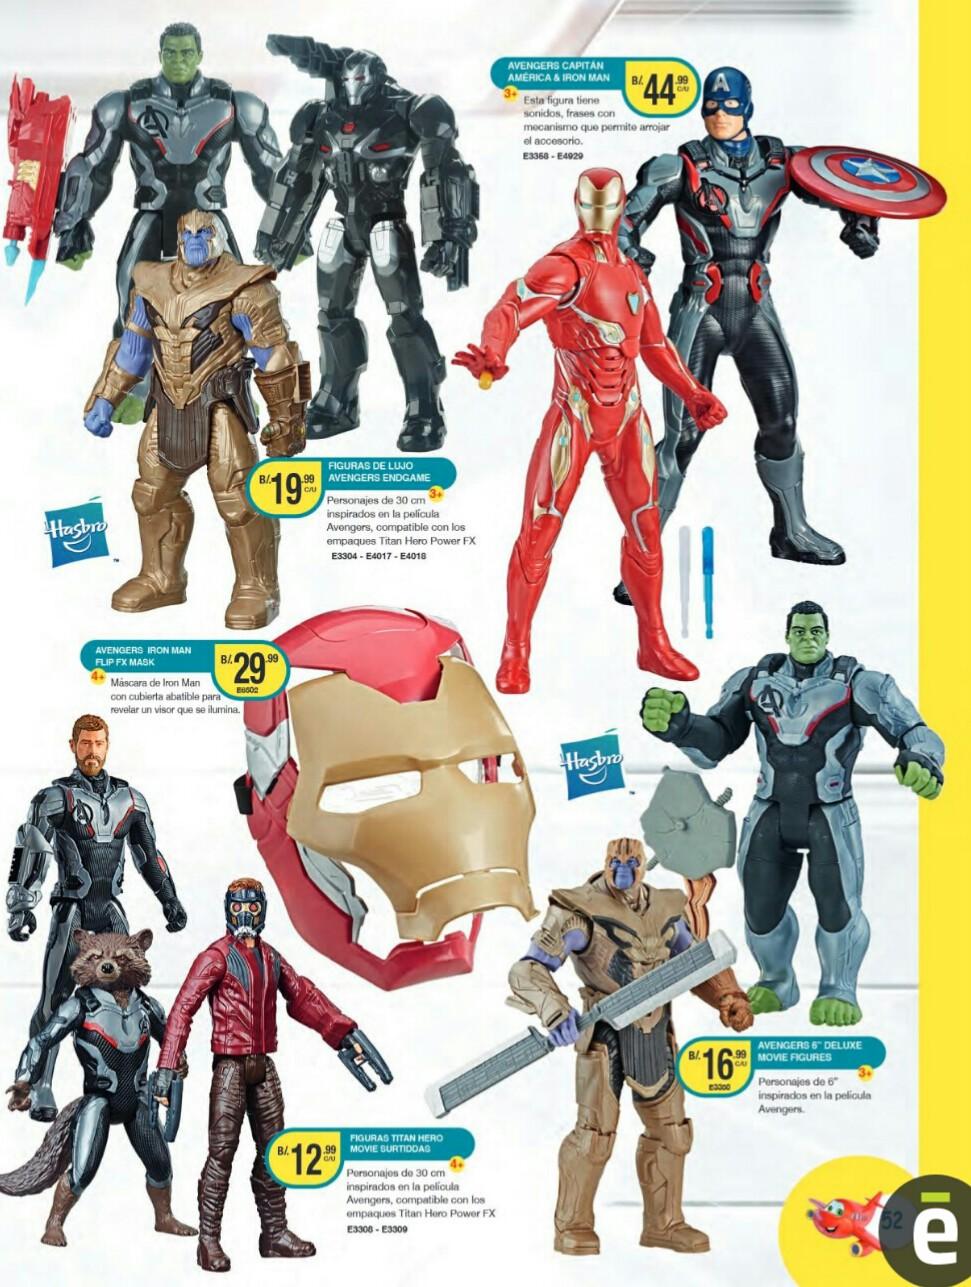 Catalogo juguetes Titan Toys 2019 p52